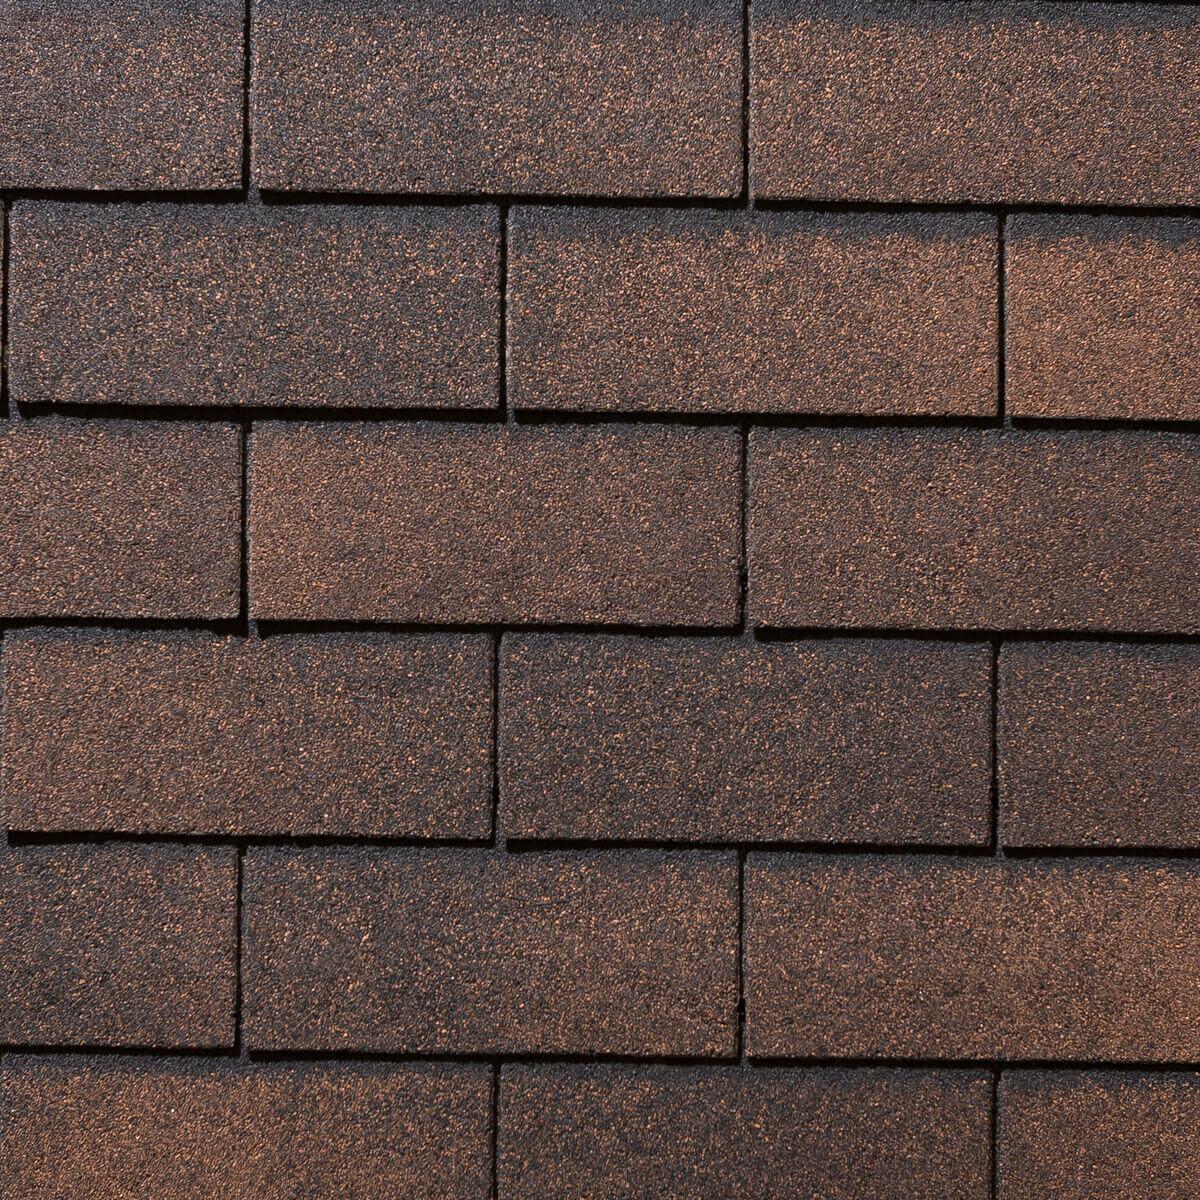 Yukon 3-tab Roofing Shingles - Autumn Brown